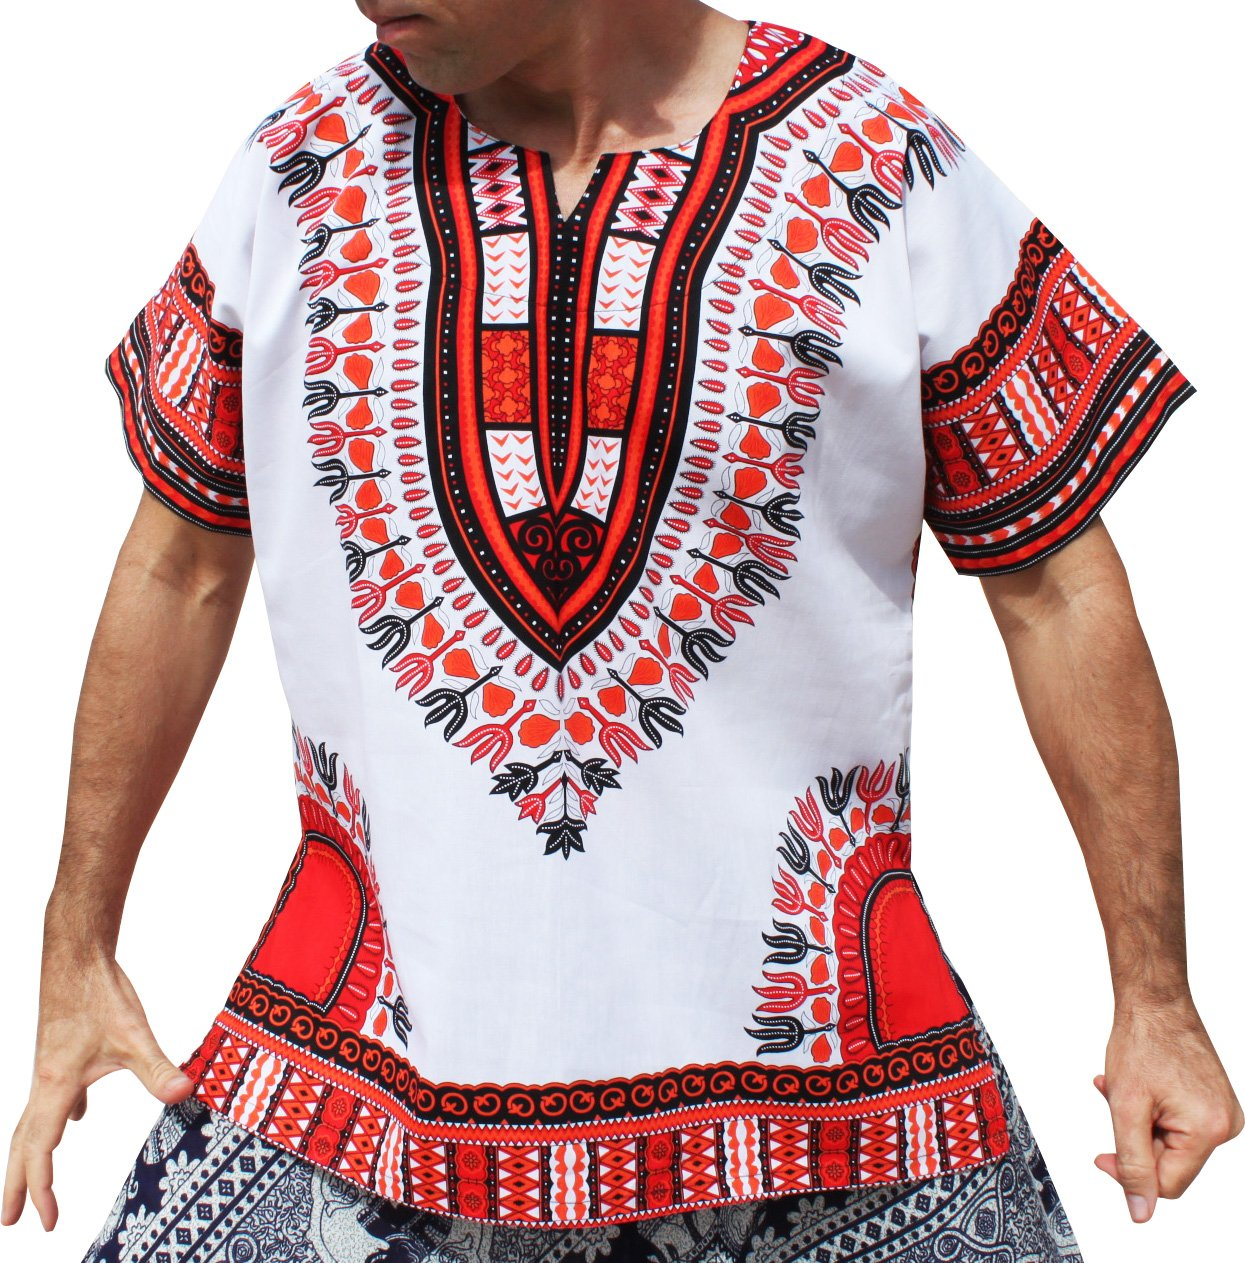 RaanPahMuang Brand Unisex Bright White Cotton Africa Dashiki Shirt Plain Front variant20830AMZ